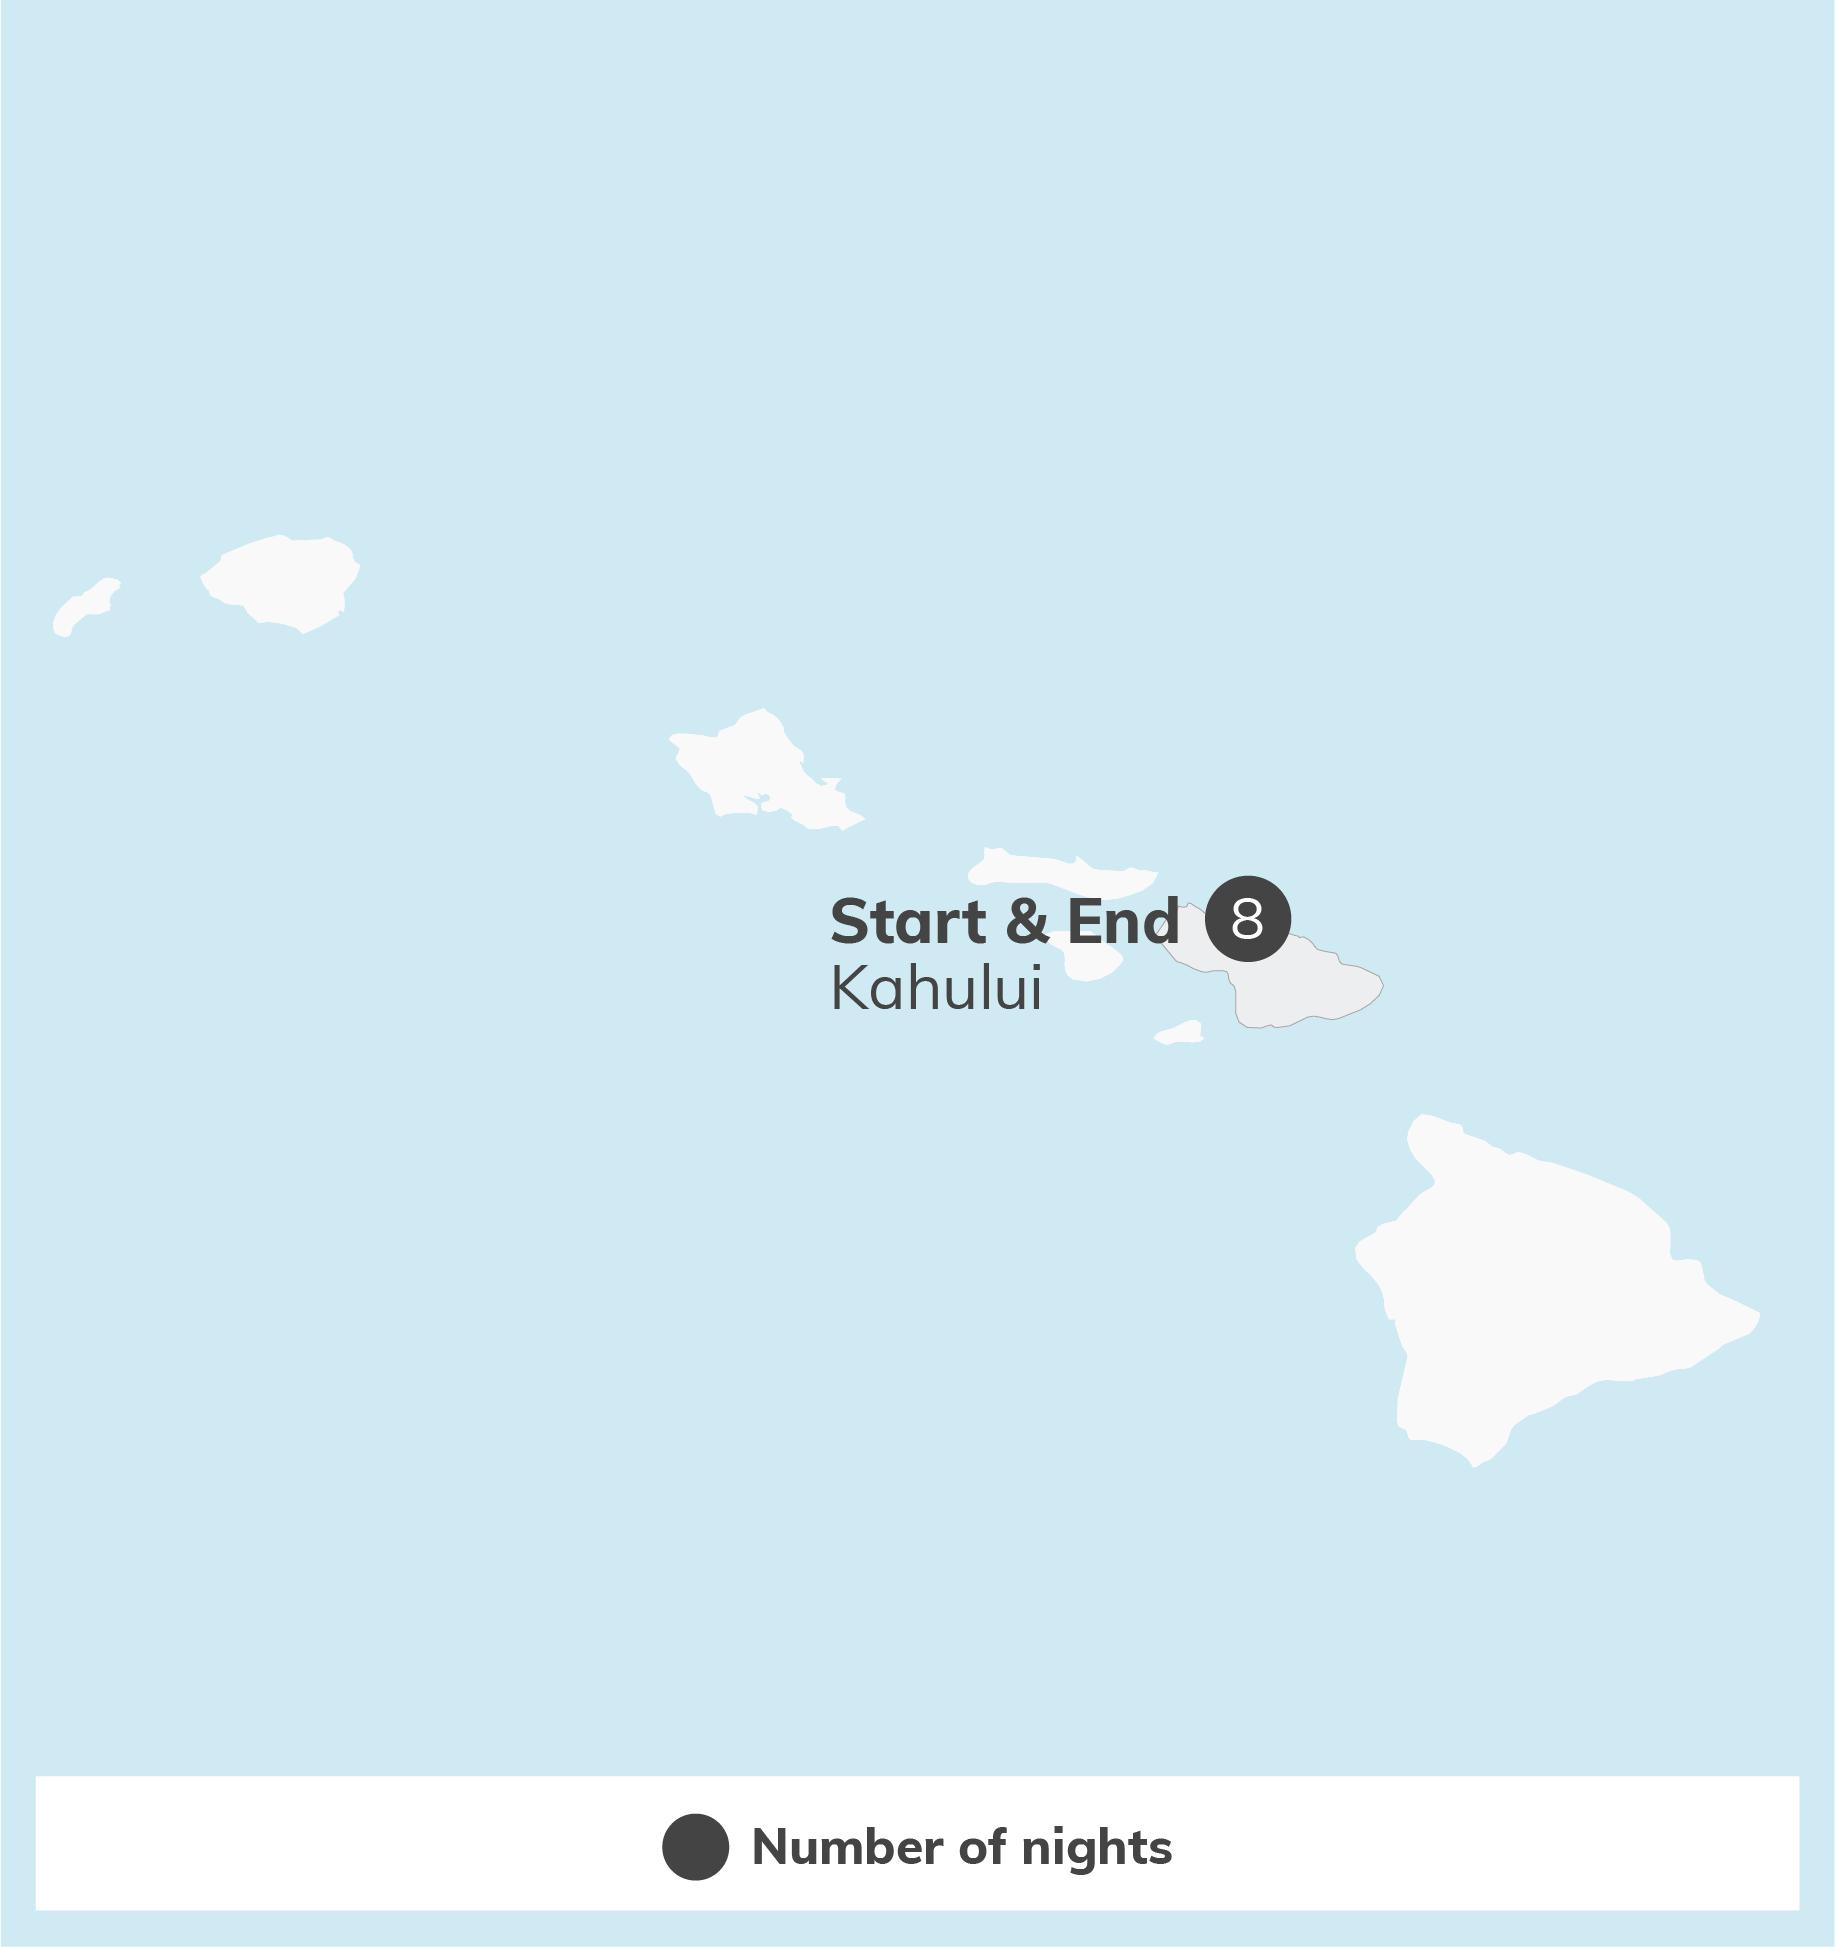 Hawaii Community Service - 10 days